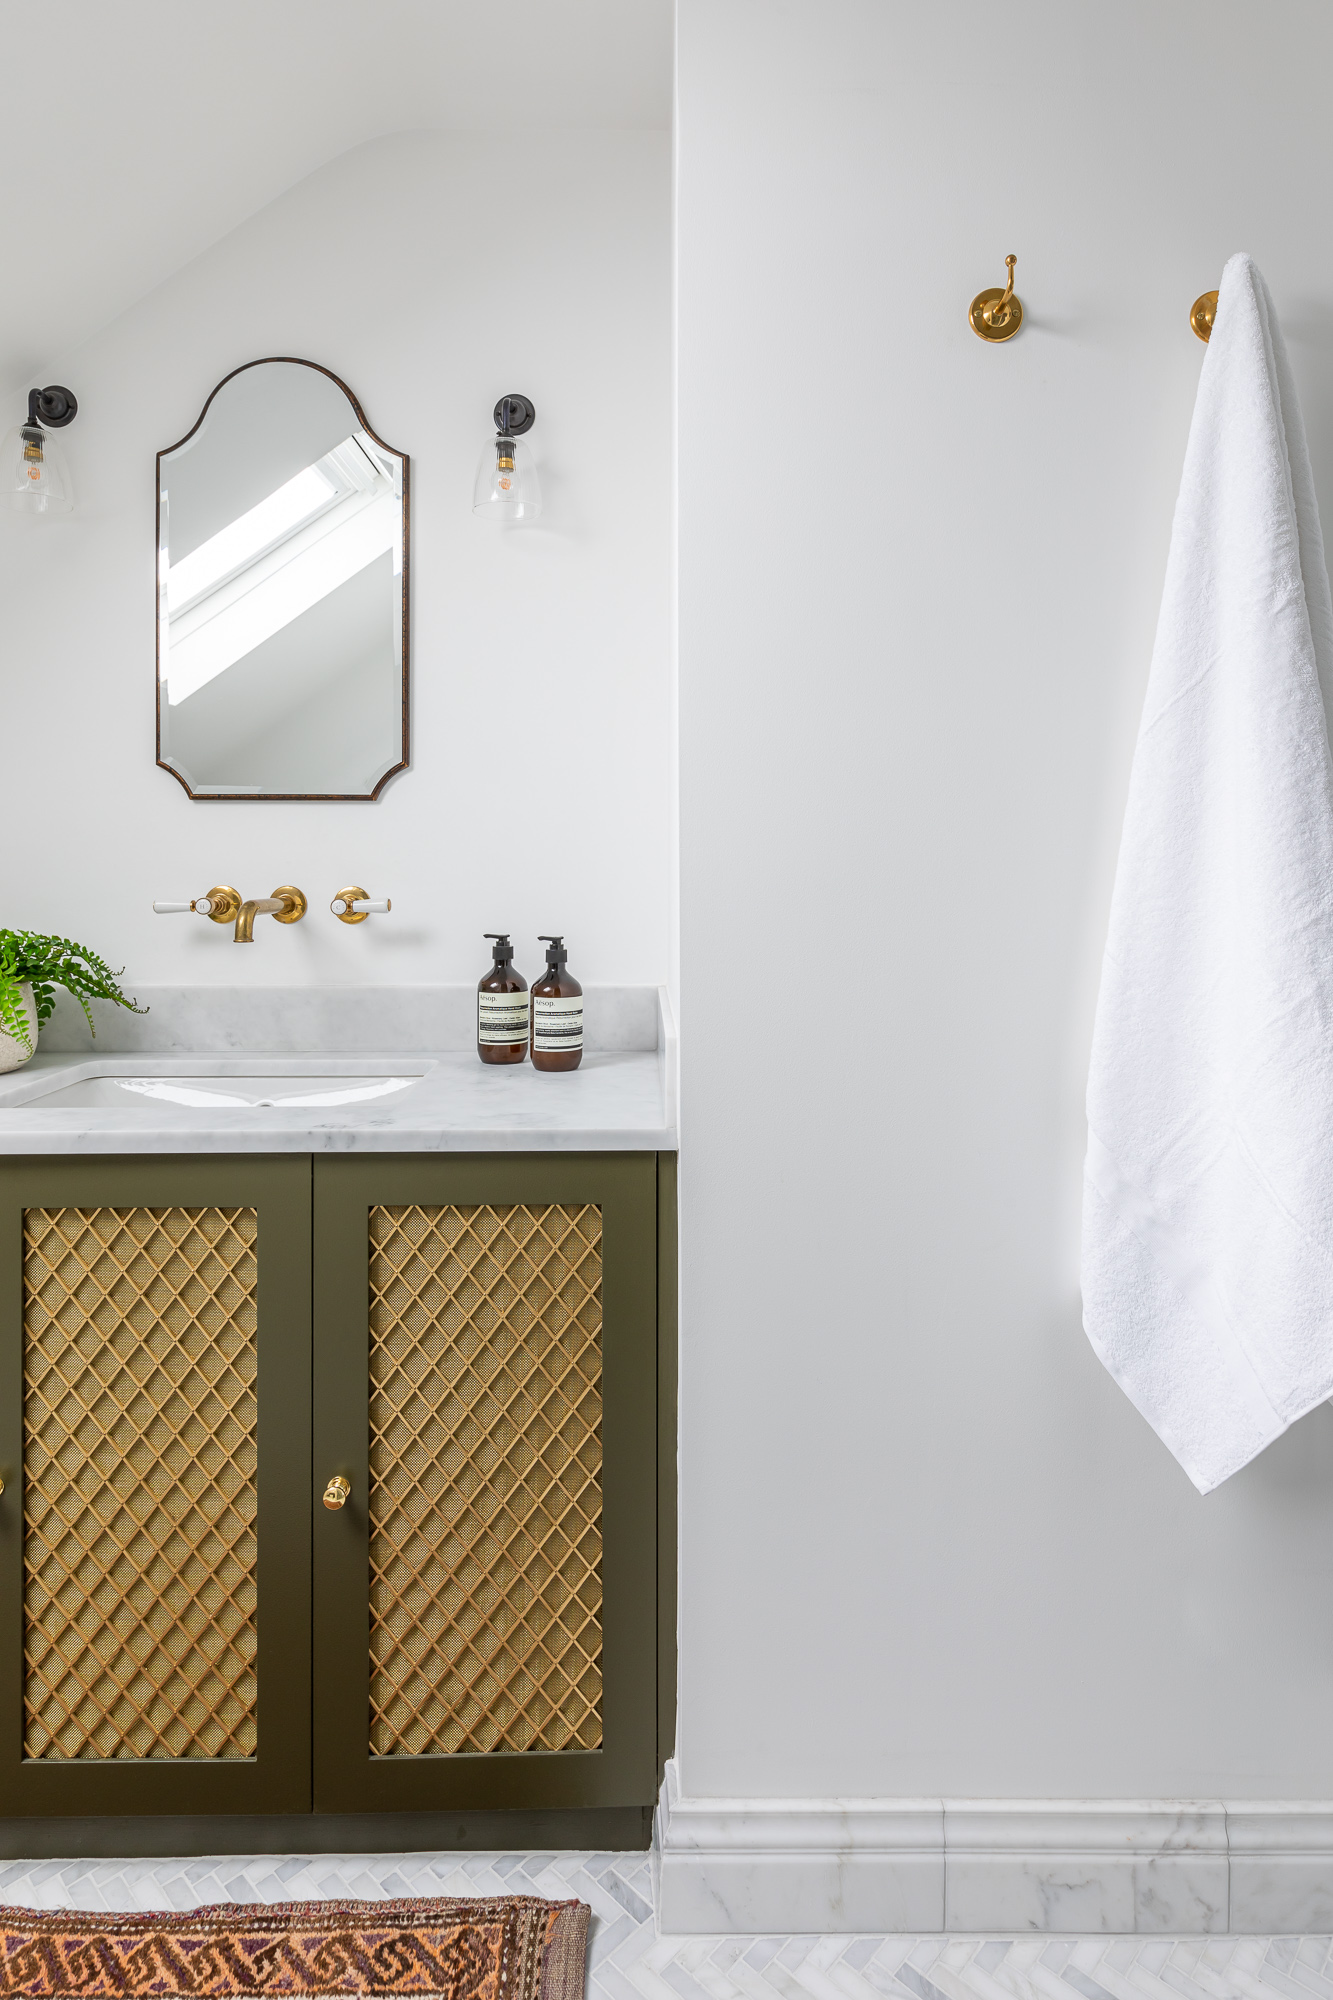 jonathan bond, bathroom vanity cabinet & towel wall hooks, clapham, london